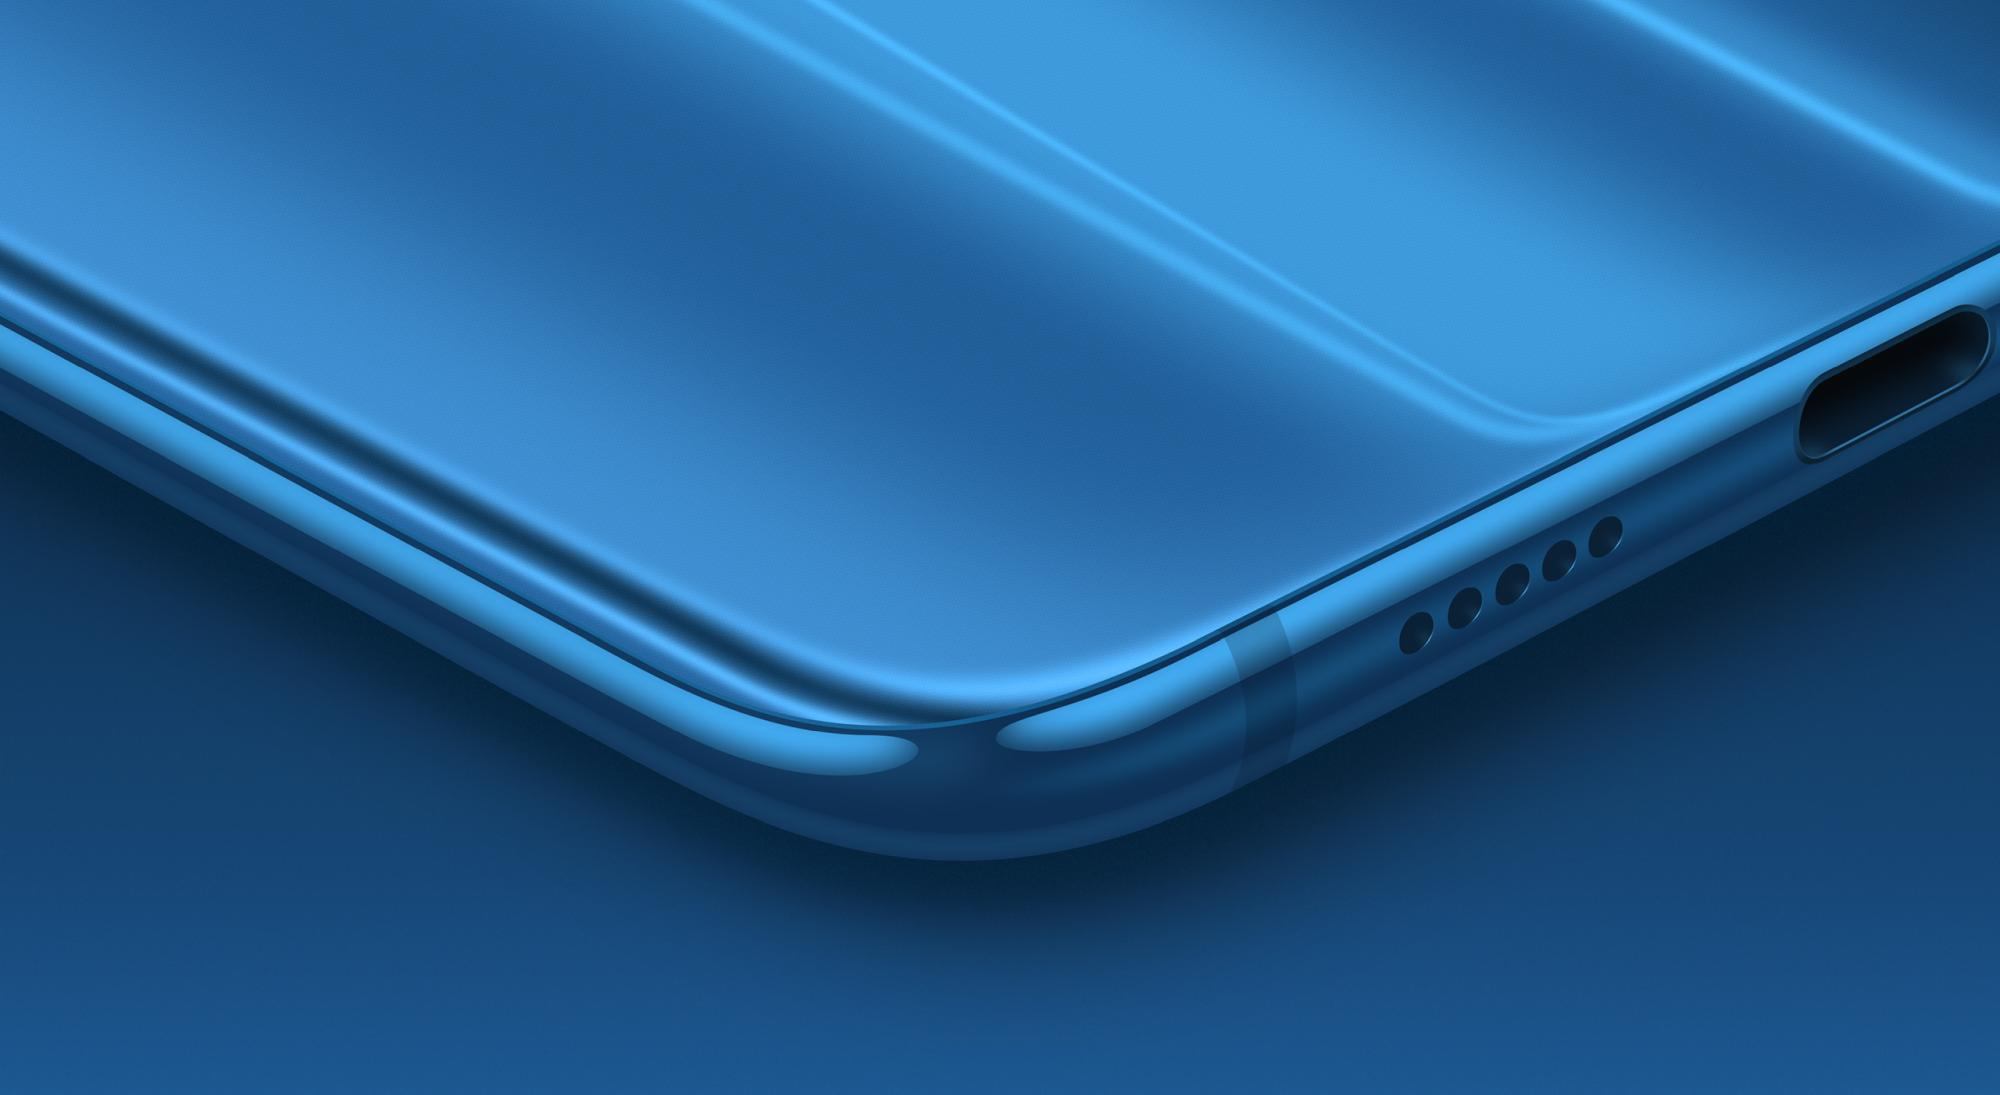 Xiaomim Mi 8